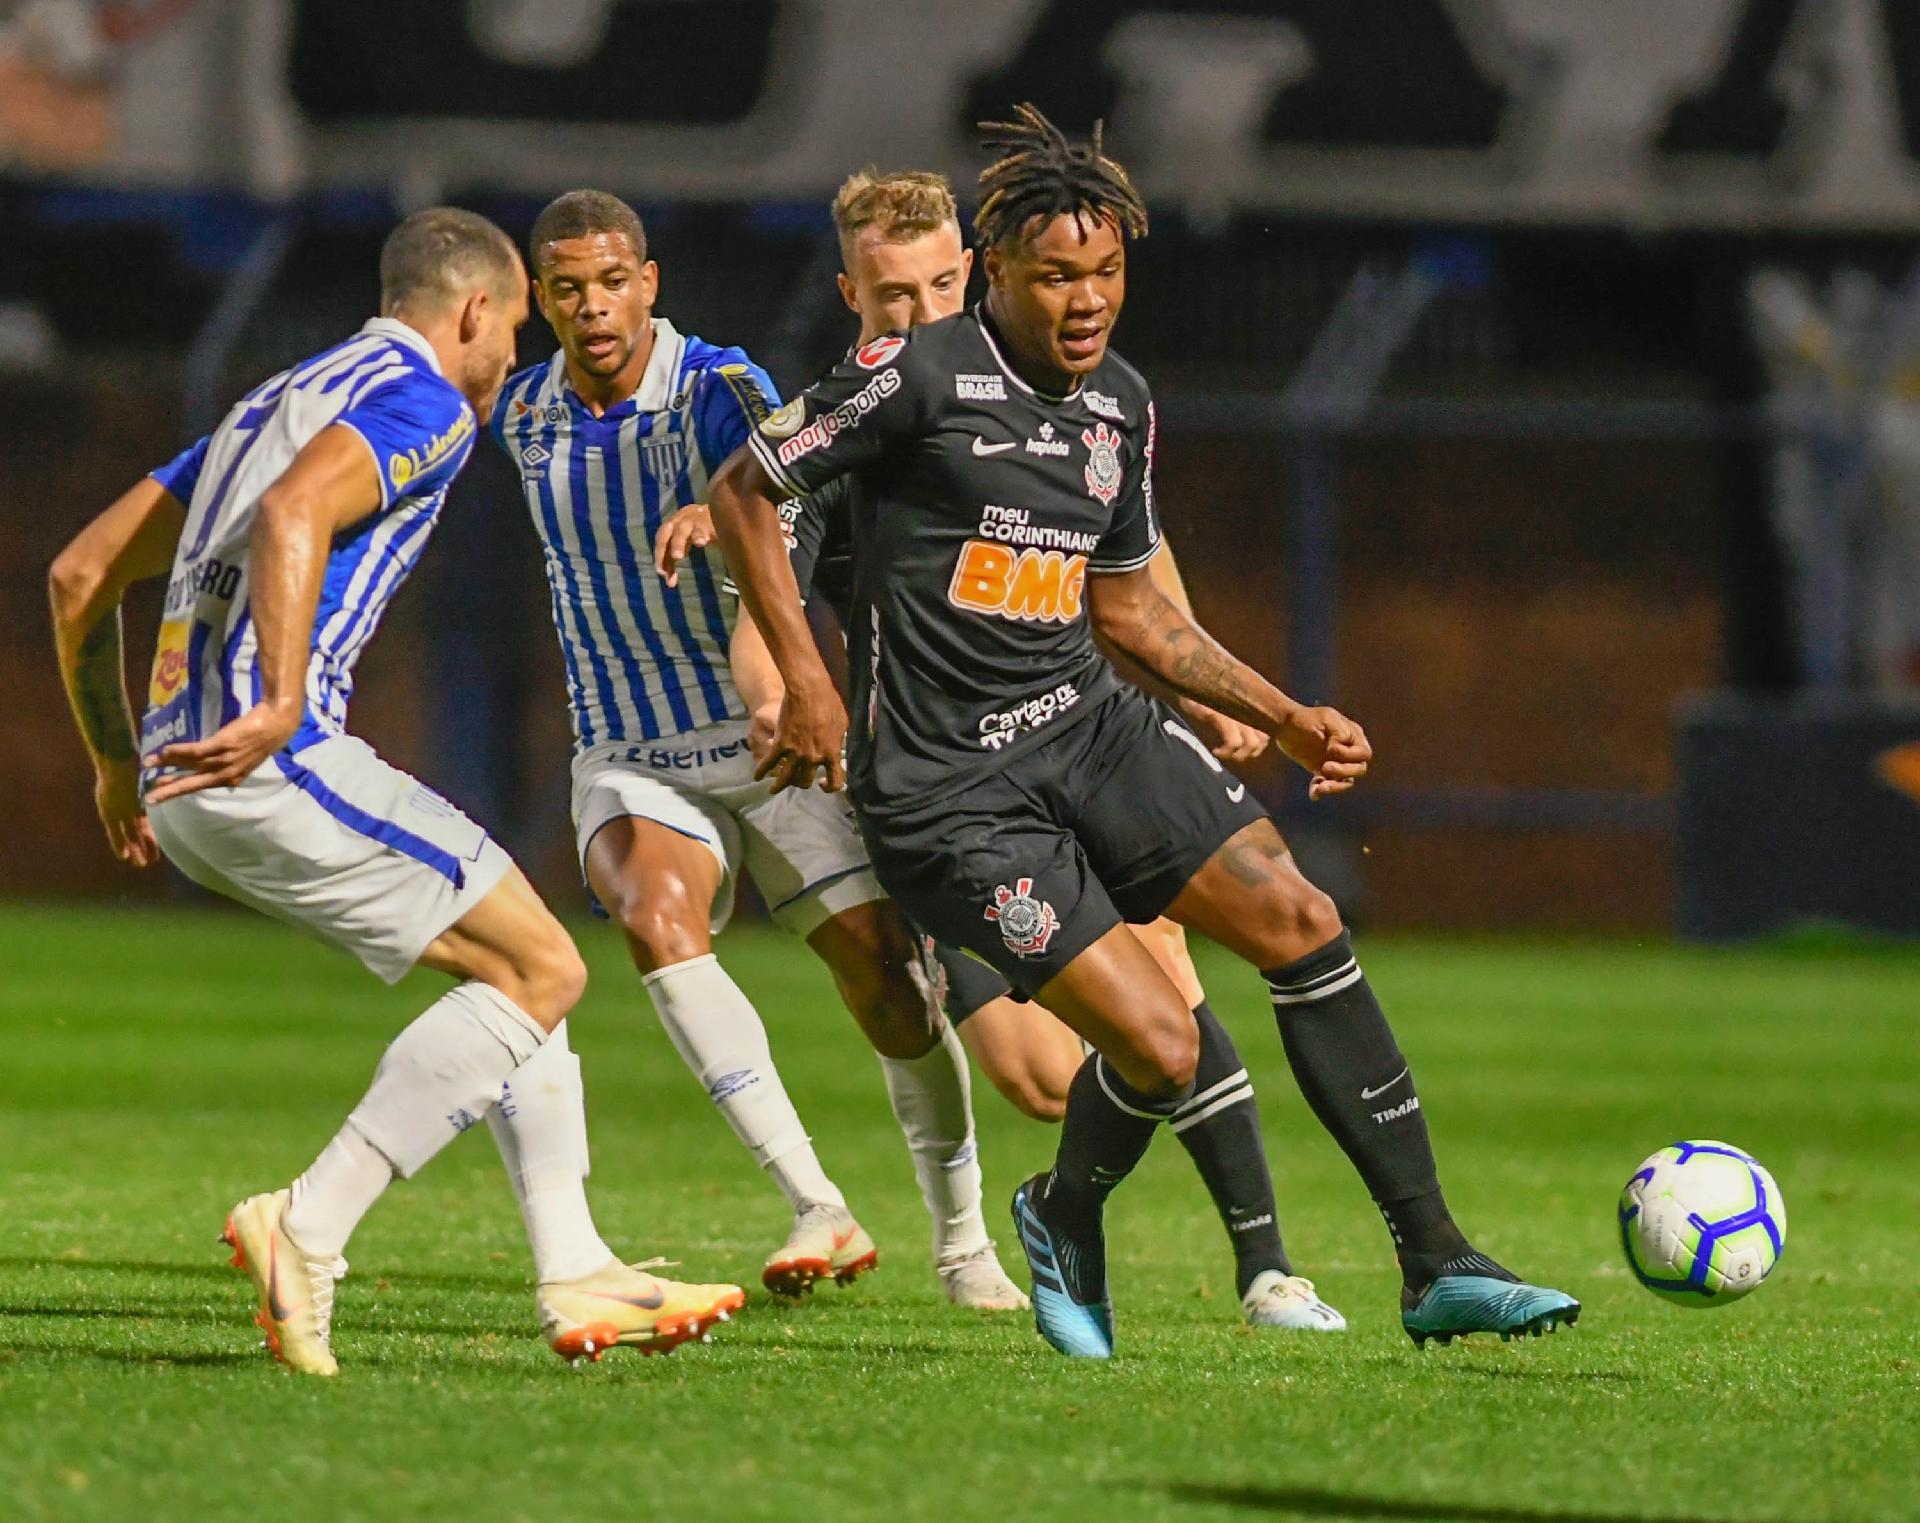 Corinthians Joga Hoje Contra O Avaí